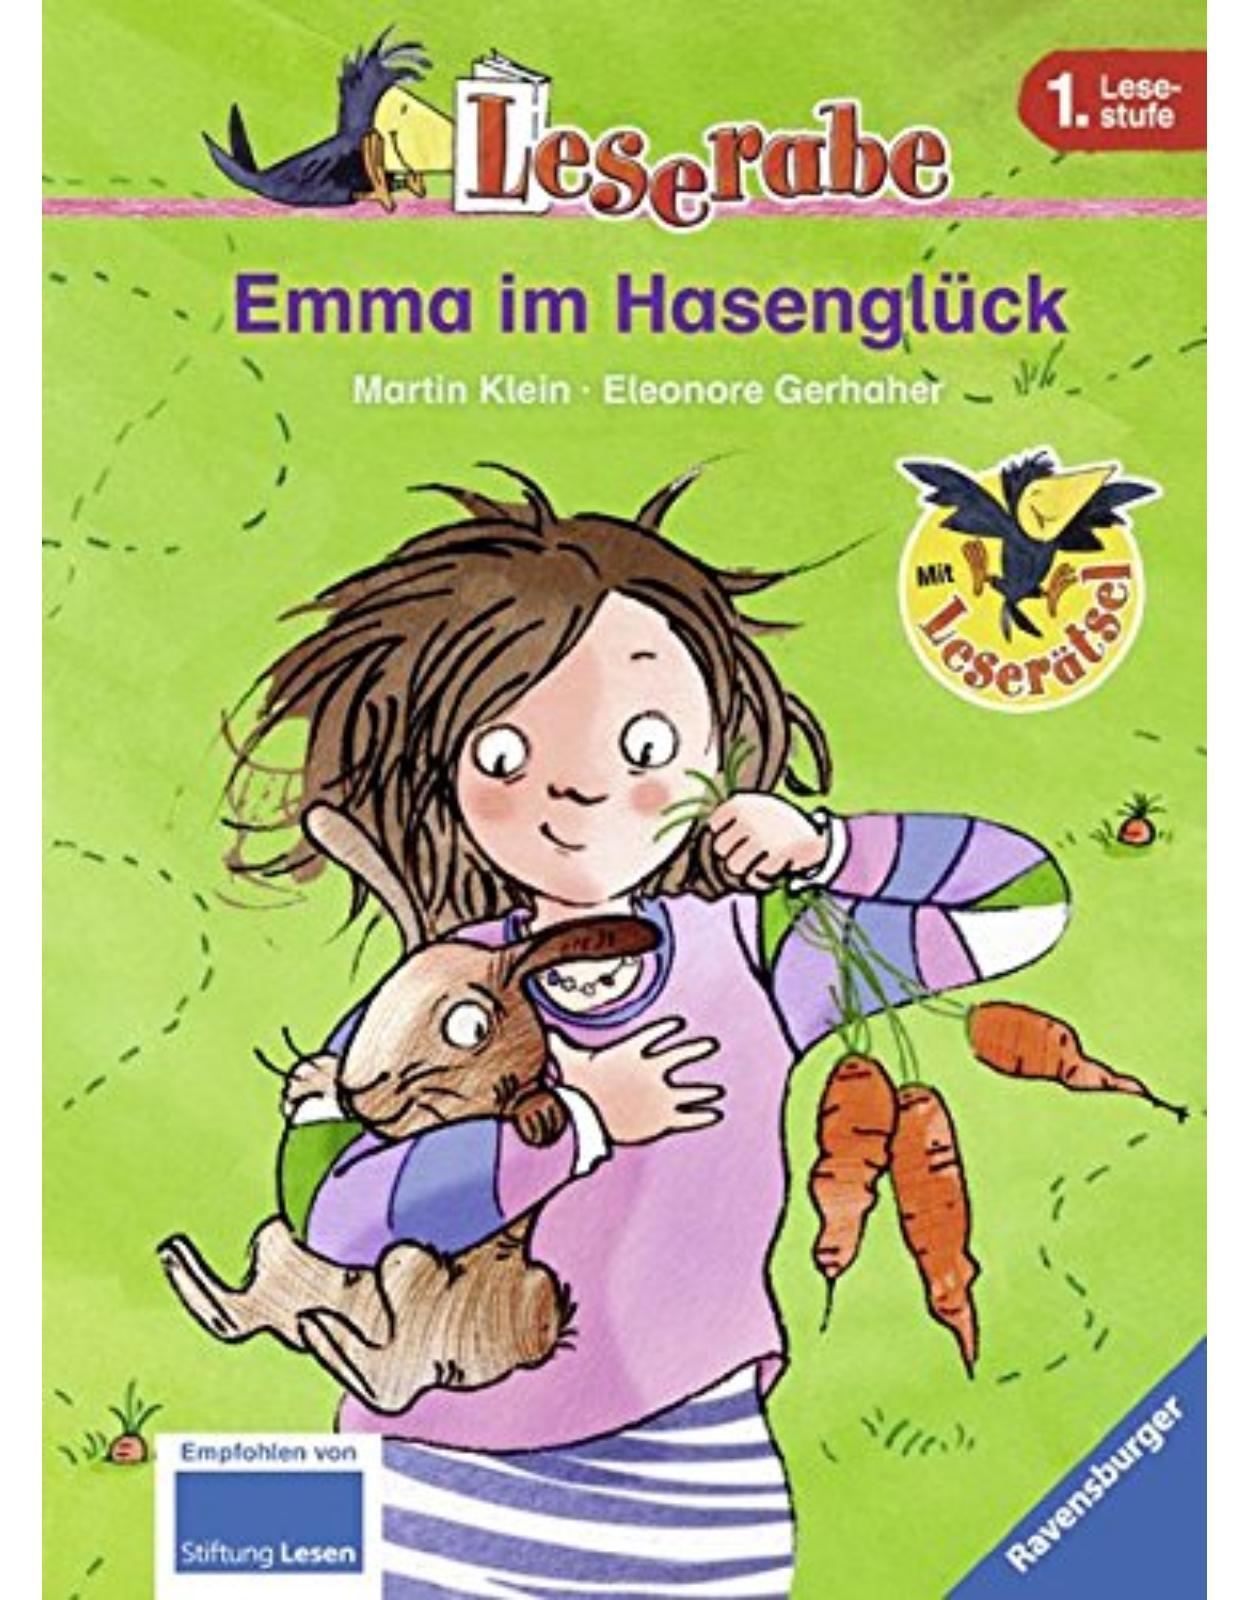 Emma im Hasengl�ck